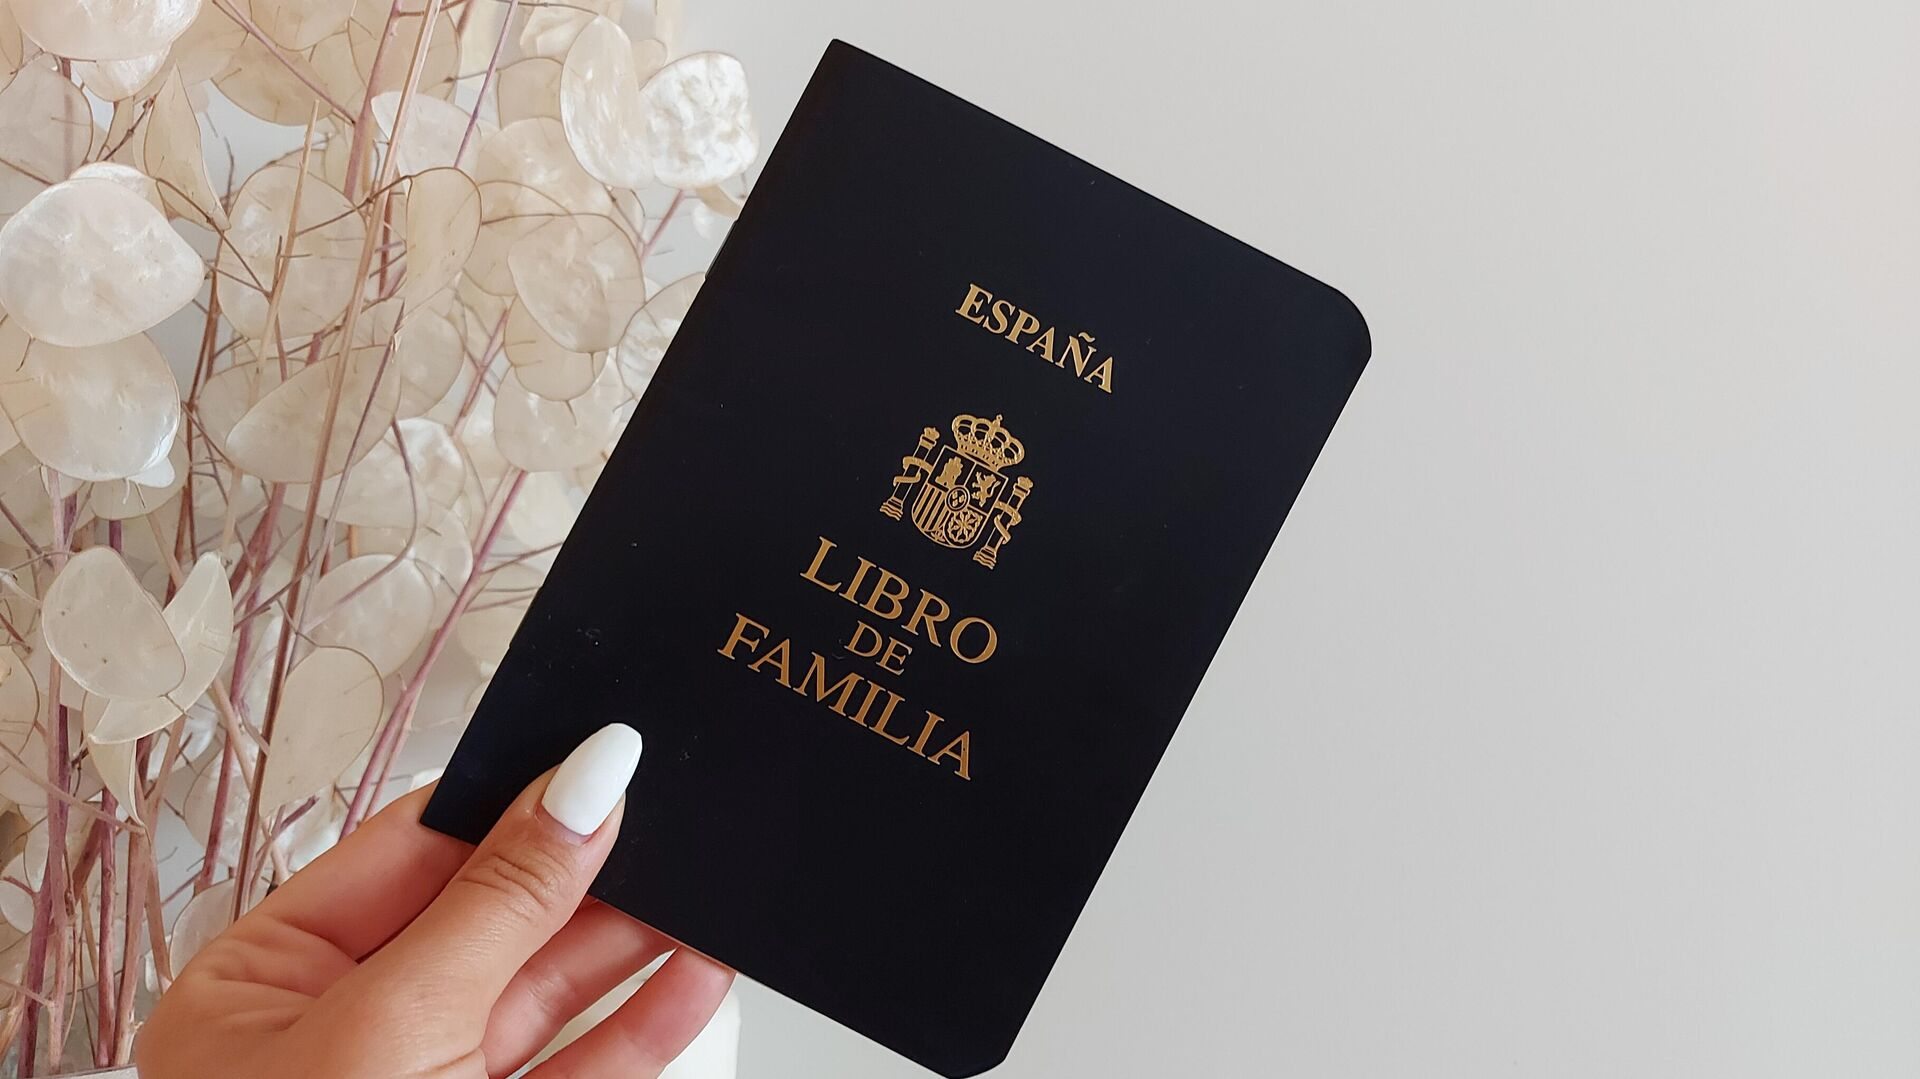 Ejemplar de Libro de Familia expedido en Madrid - Sputnik Mundo, 1920, 30.04.2021